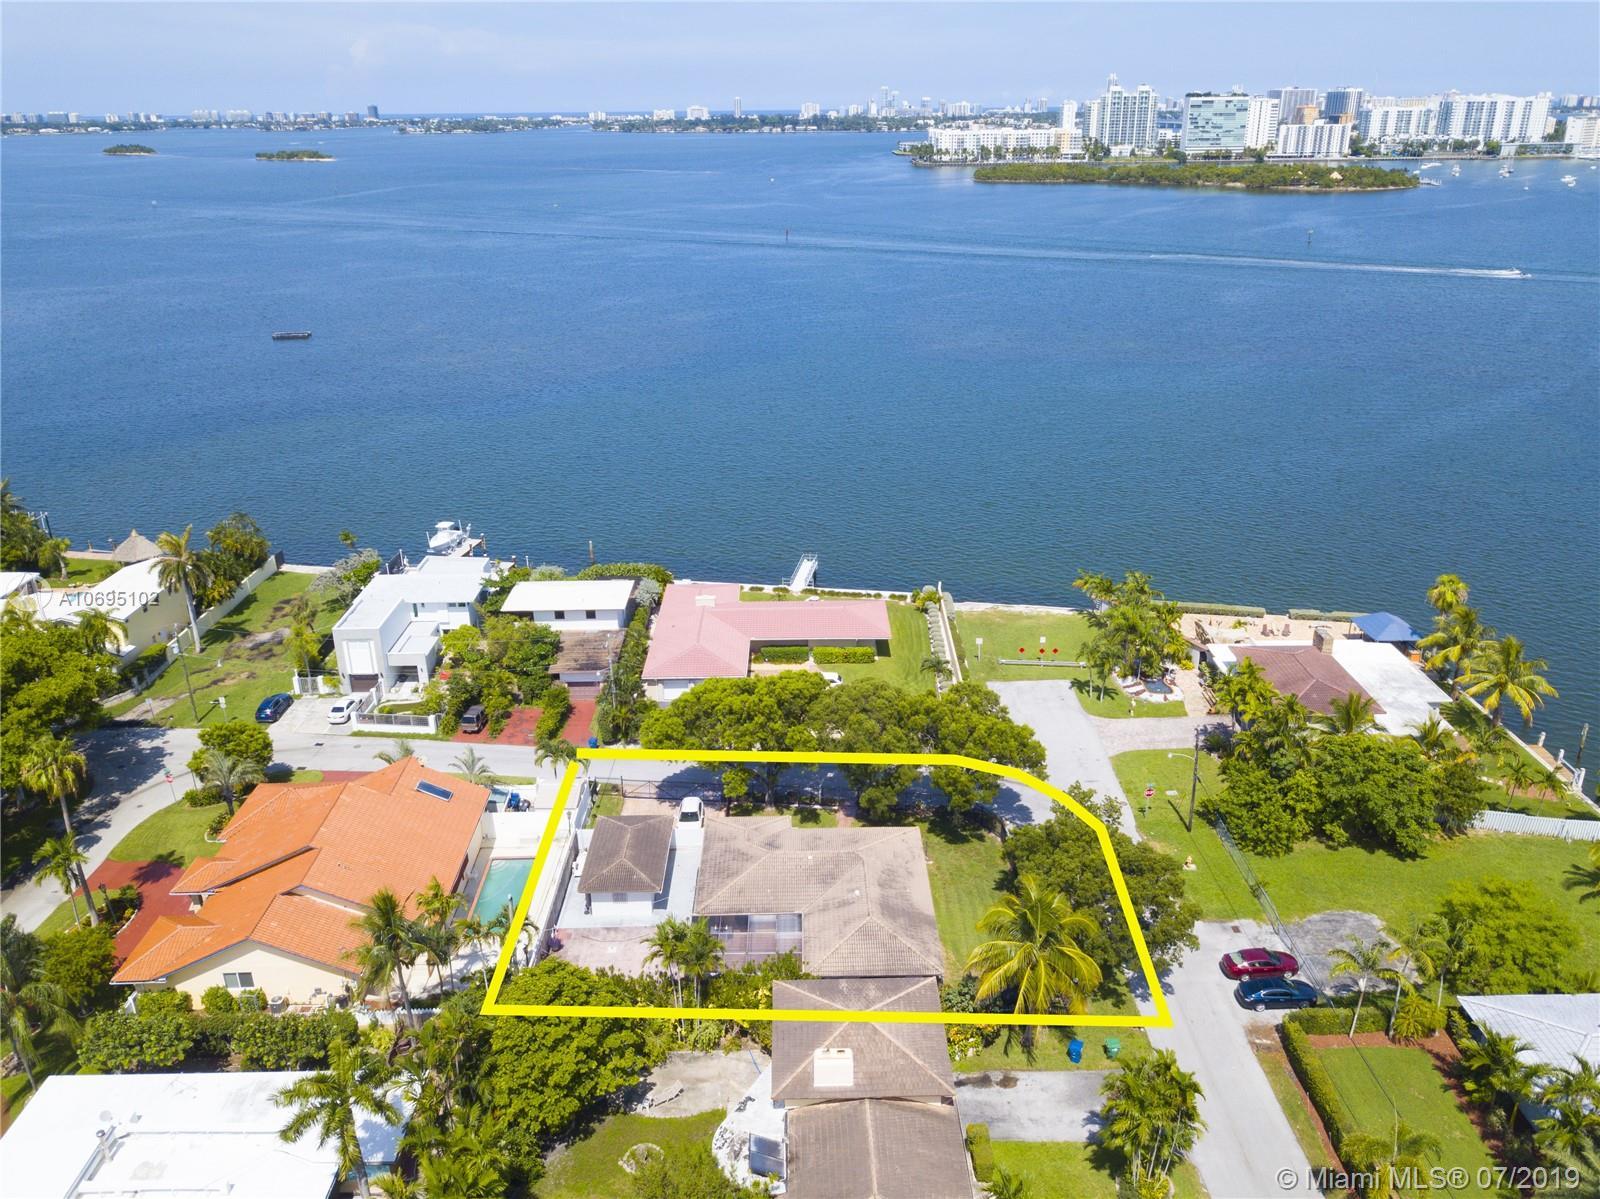 8700 N Bayshore Dr, Miami FL 33138